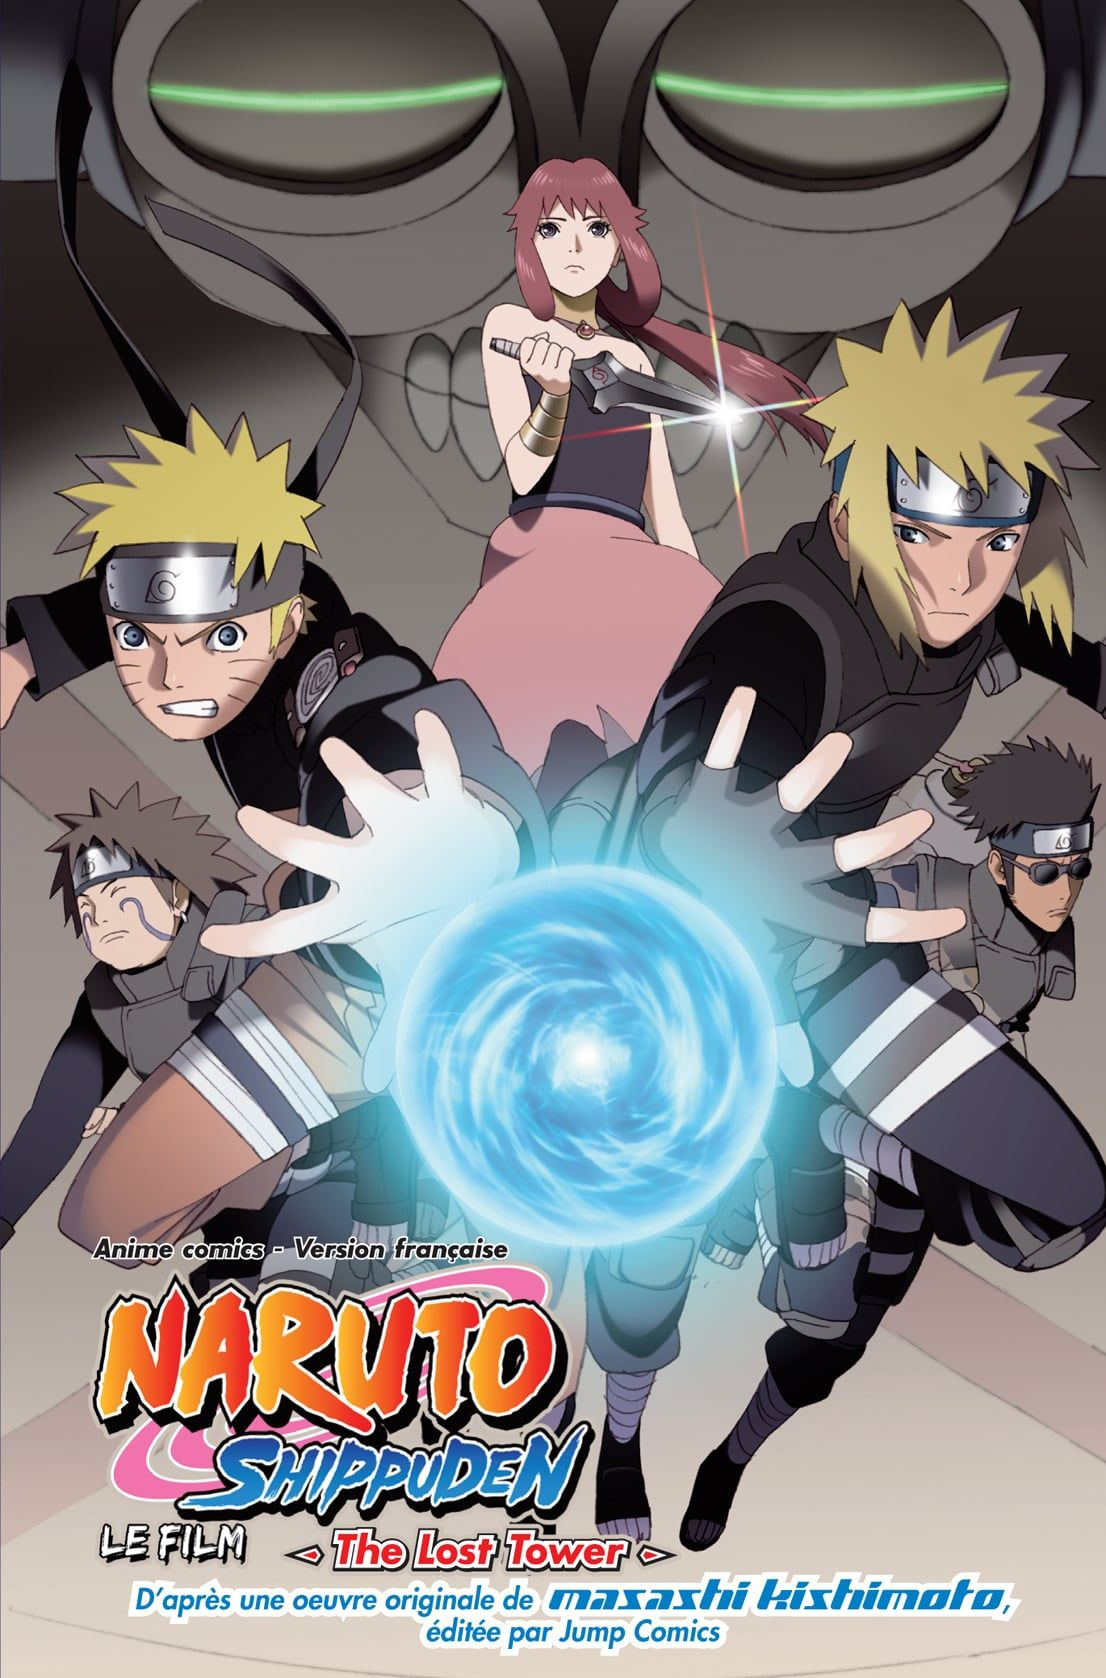 Voir Naruto Shippuden Film 4 The Lost Tower 2010 En Streaming Vf Hd Naruto Shippuden Films Complets Naruto Uzumaki